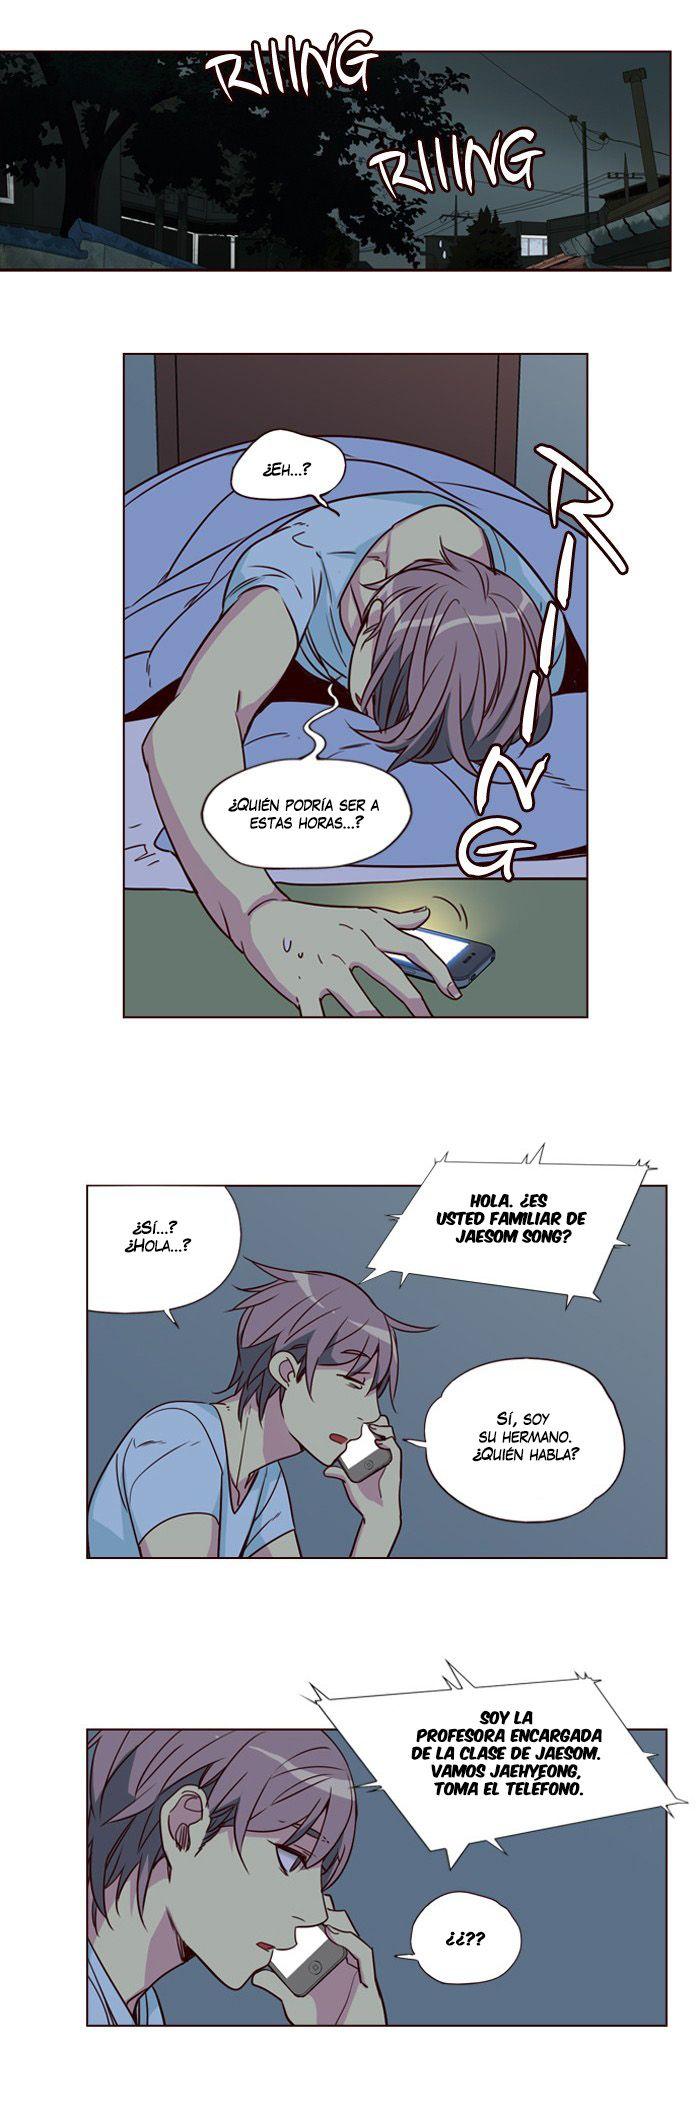 http://c5.ninemanga.com/es_manga/pic2/32/416/506209/b13432d01614c9d18263698af2837e1e.jpg Page 8